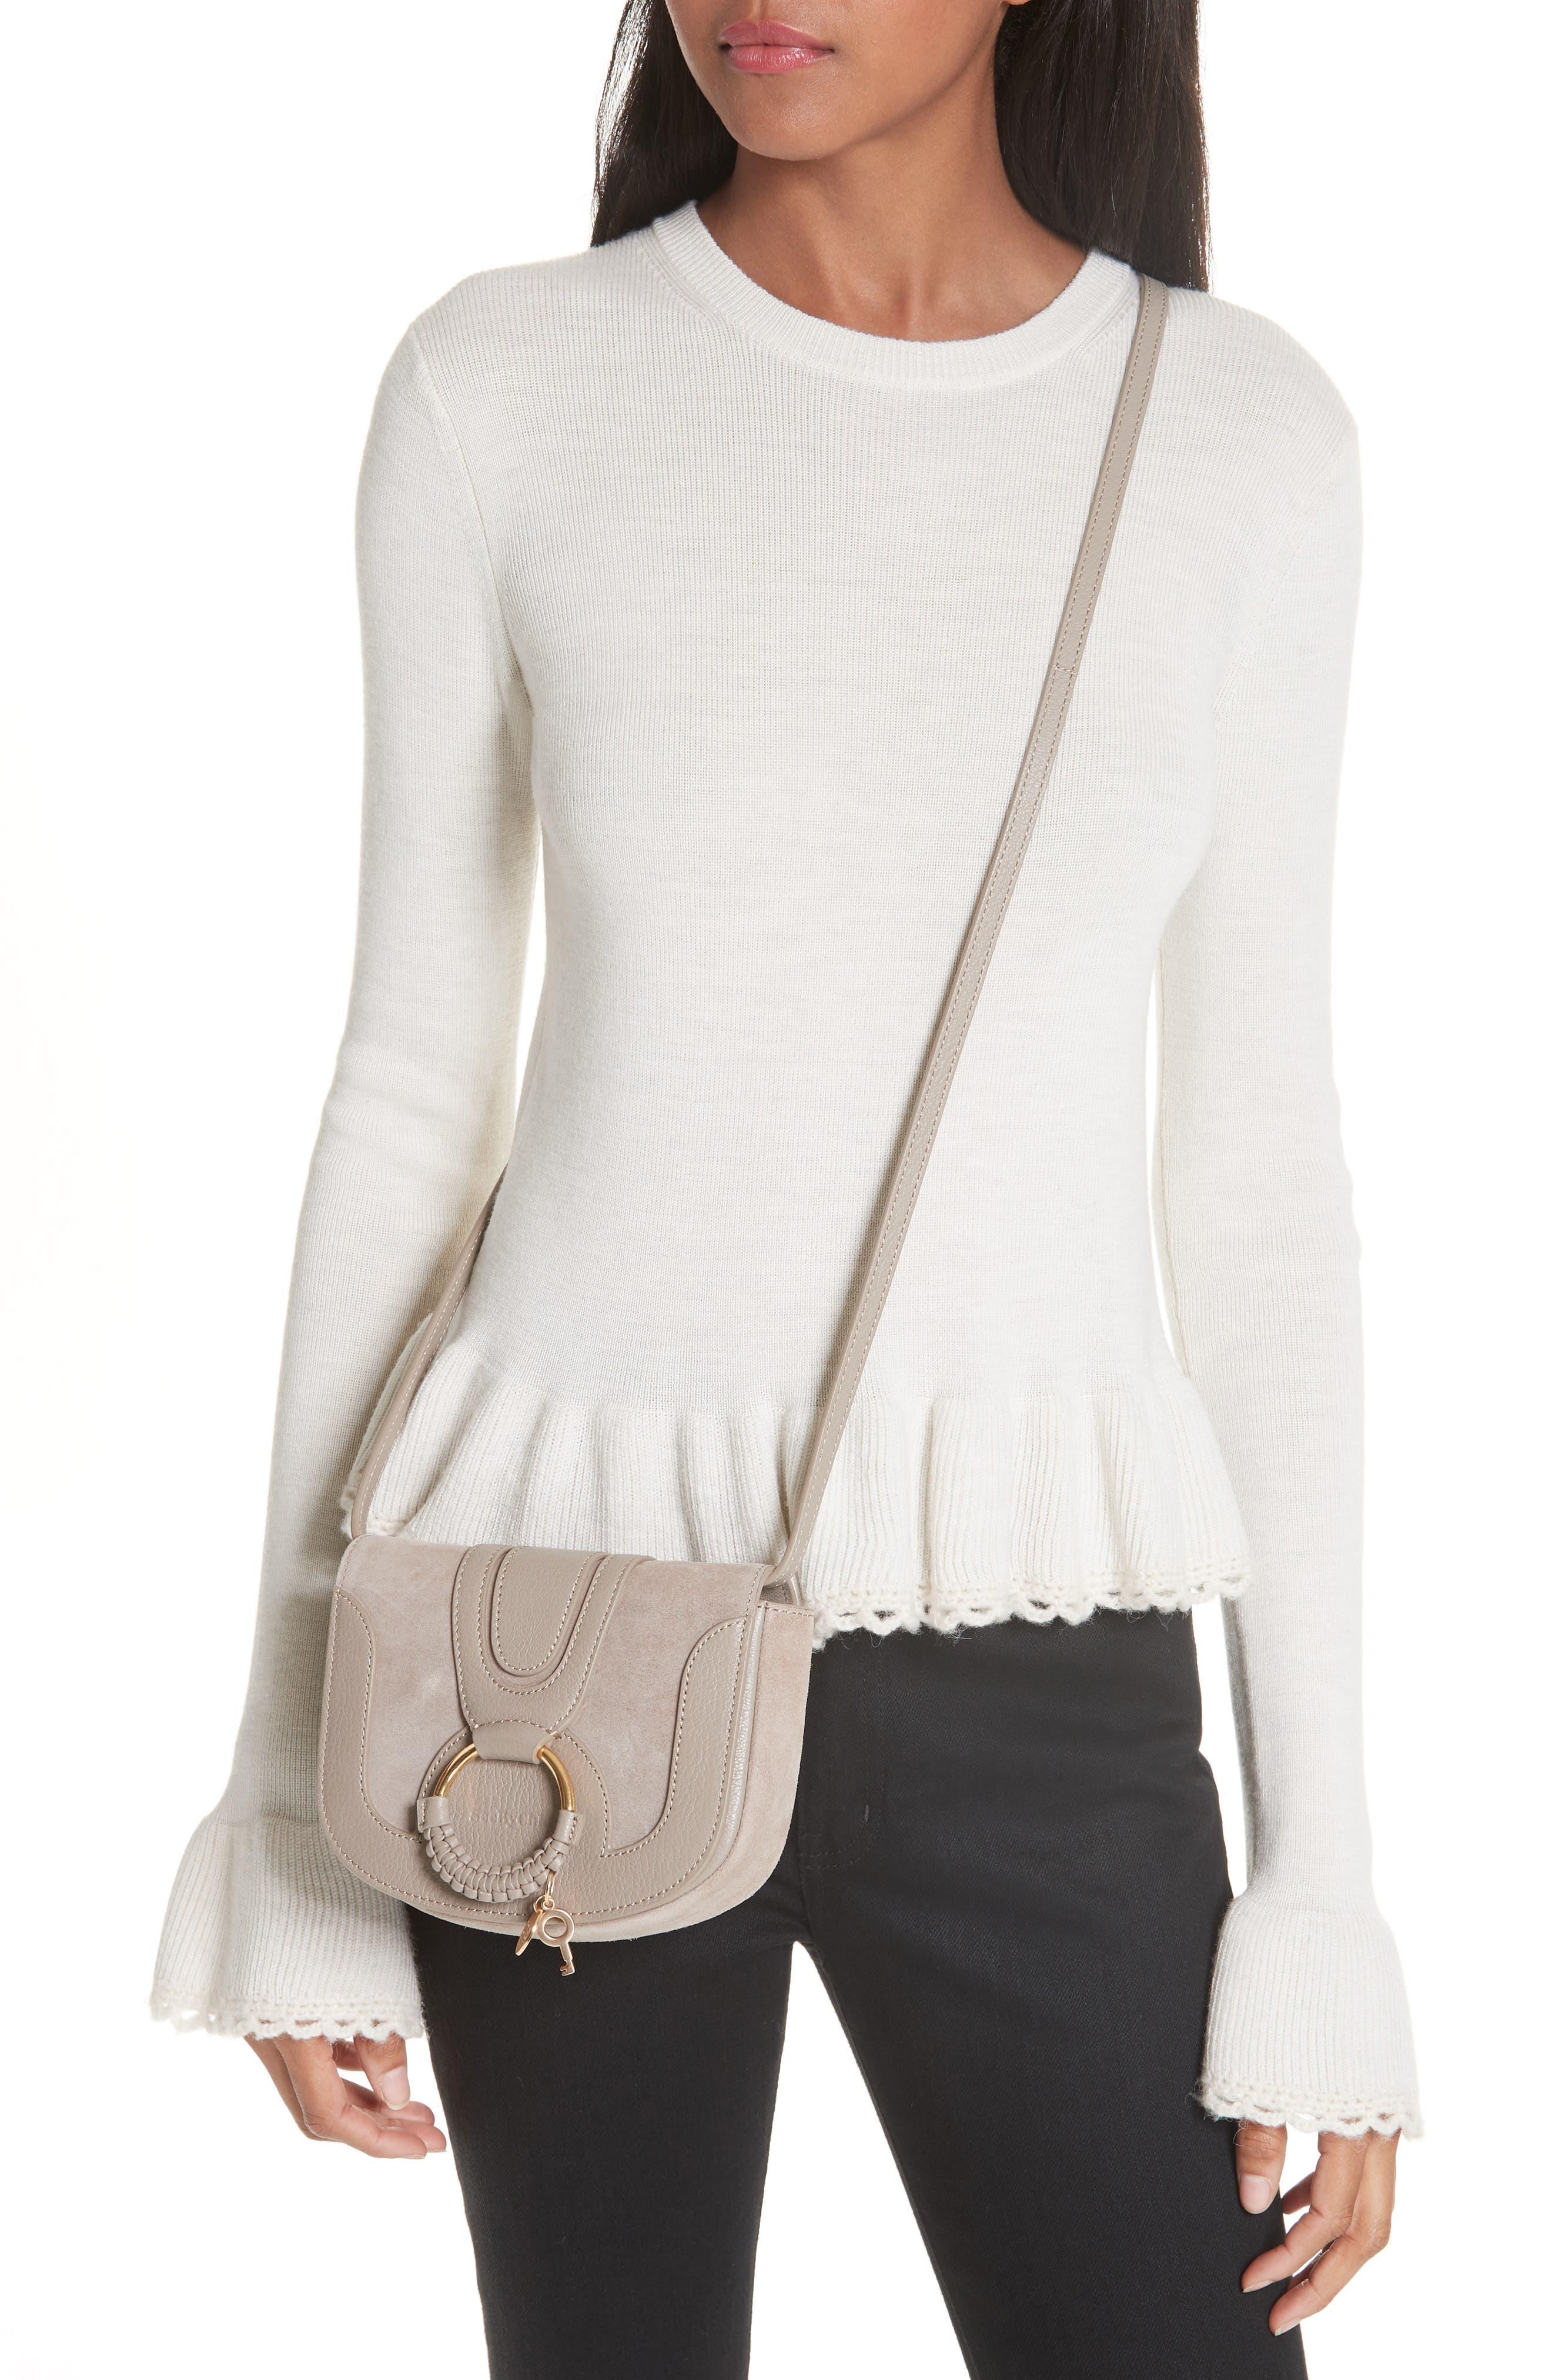 Hana Small Leather Crossbody Bag,                             Alternate thumbnail 2, color,                             Motty Grey